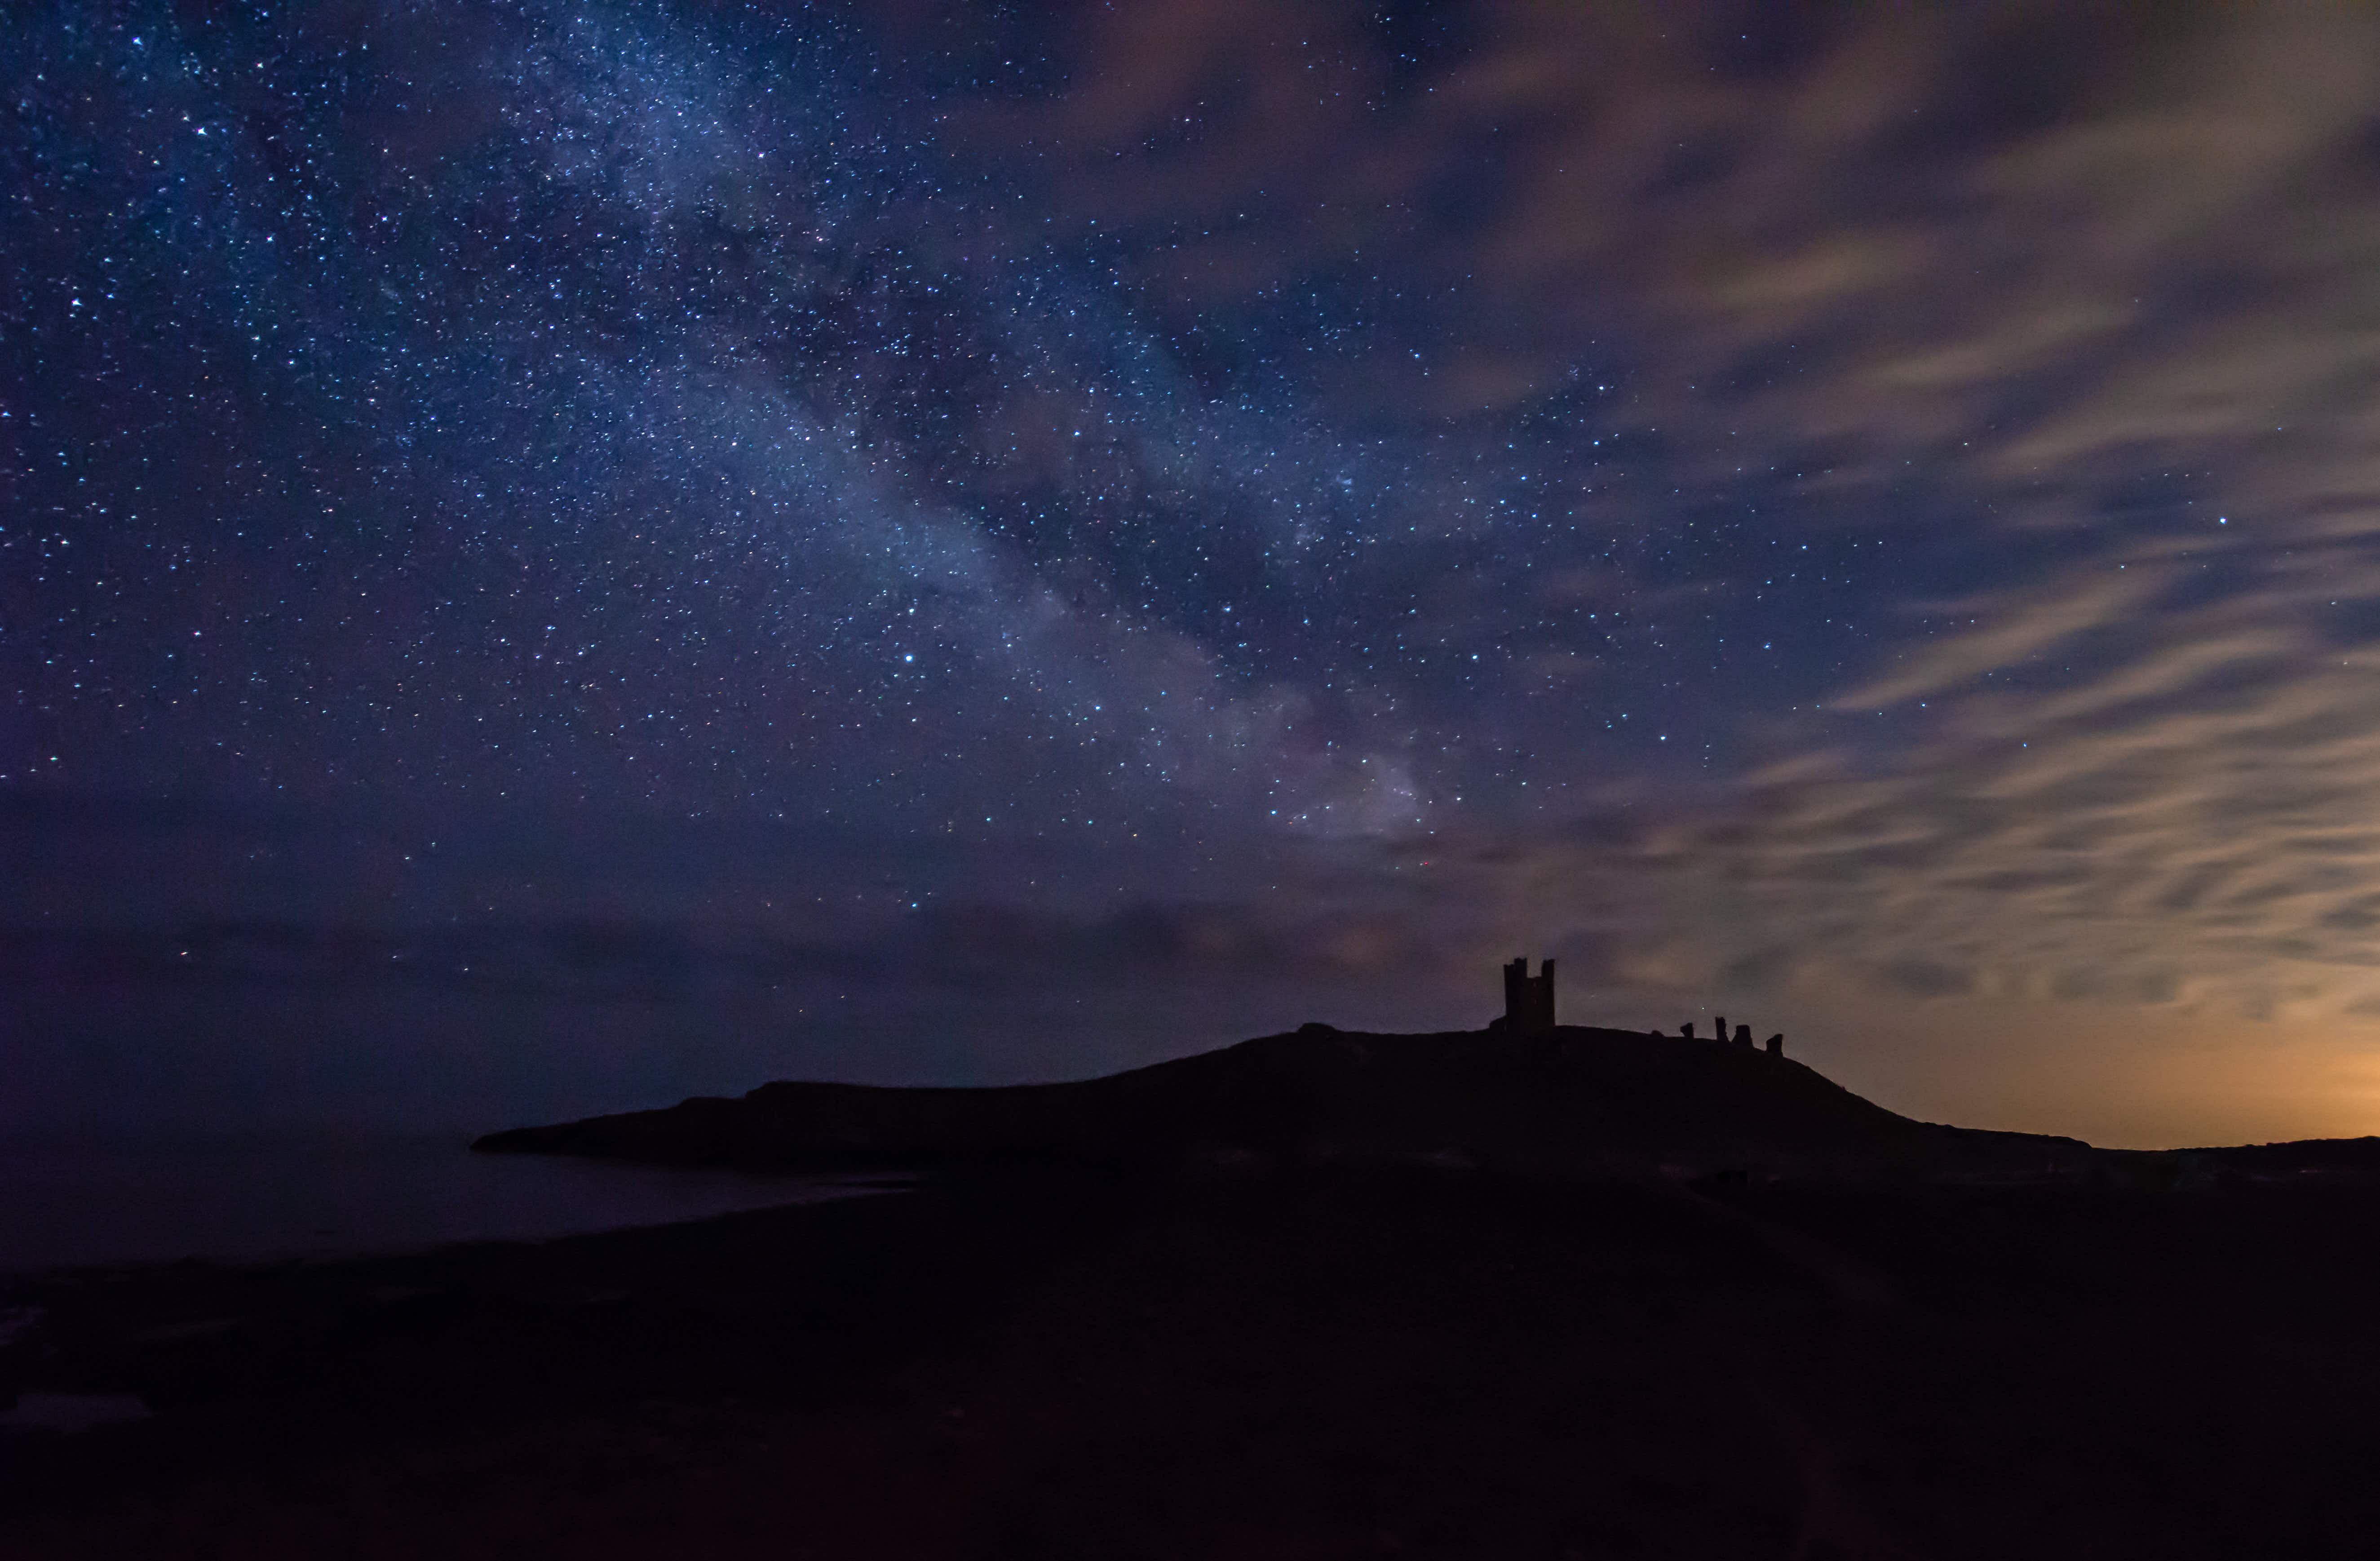 Stargazers can spot January's Quadrantid meteor shower